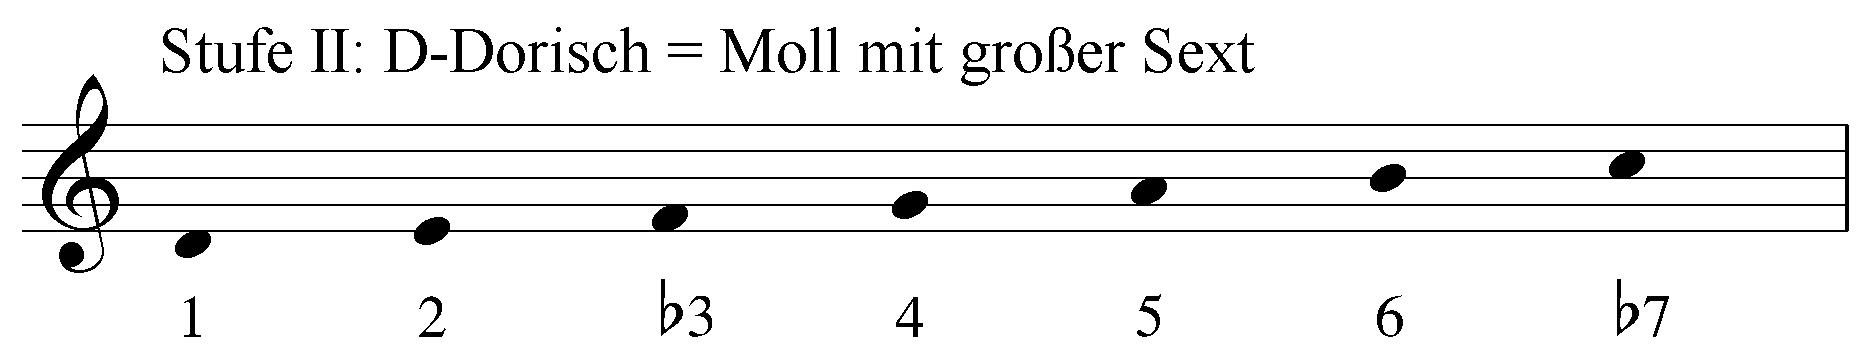 Stufe 2 D-Dorisch = Moll mit großer Sext. Intervalle 1 2 b3 4 5 6 b7